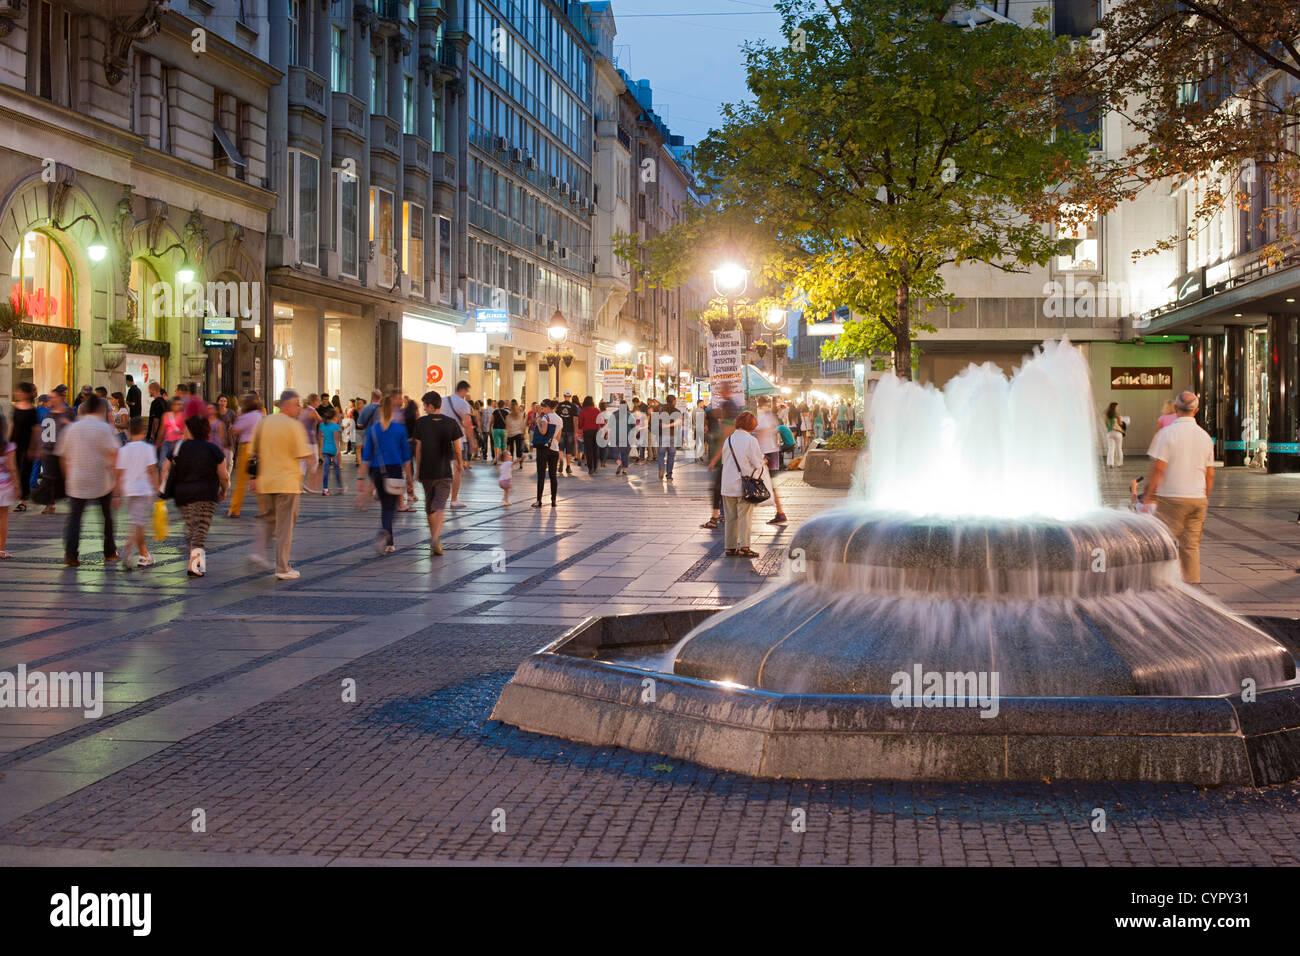 Fountain on Kneza Mihaila street in Belgrade, the capital of Serbia. - Stock Image